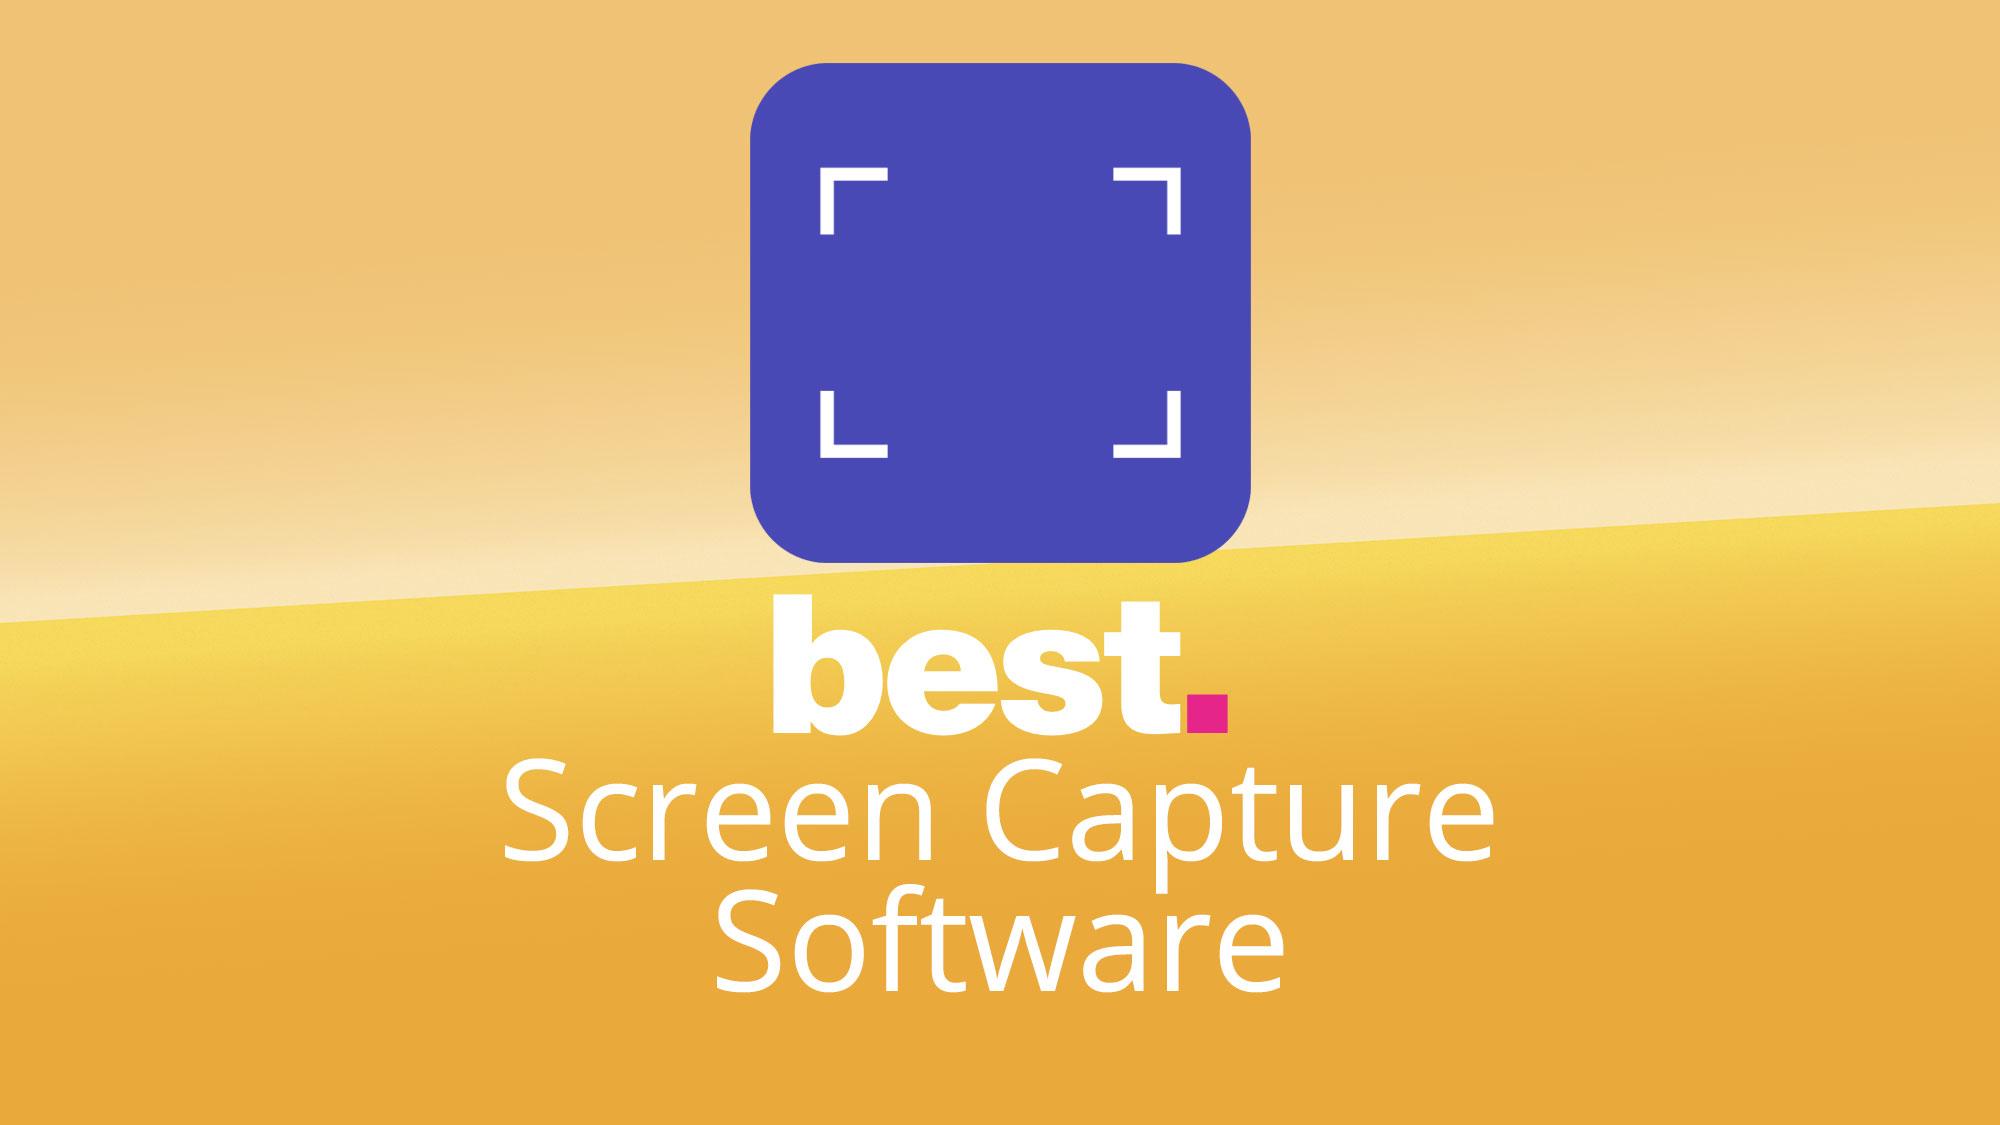 print screen software windows 7 free download